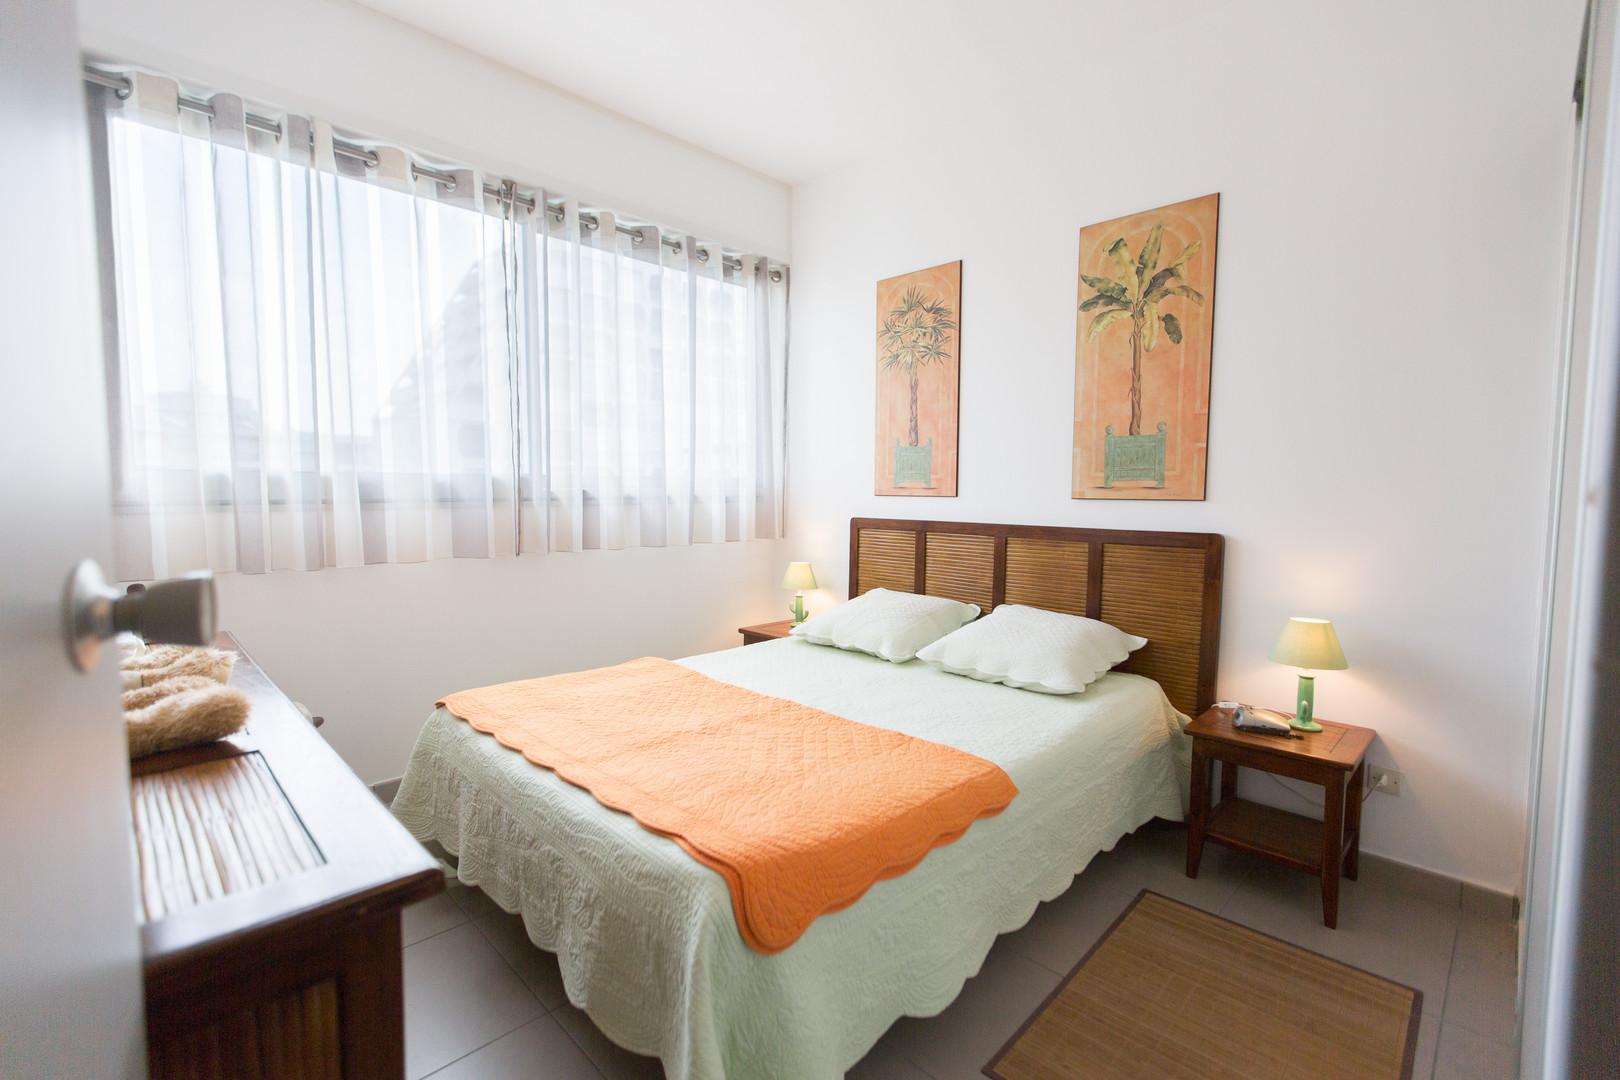 photographie  photography chambre  bedroom décoration  déco  immobilier